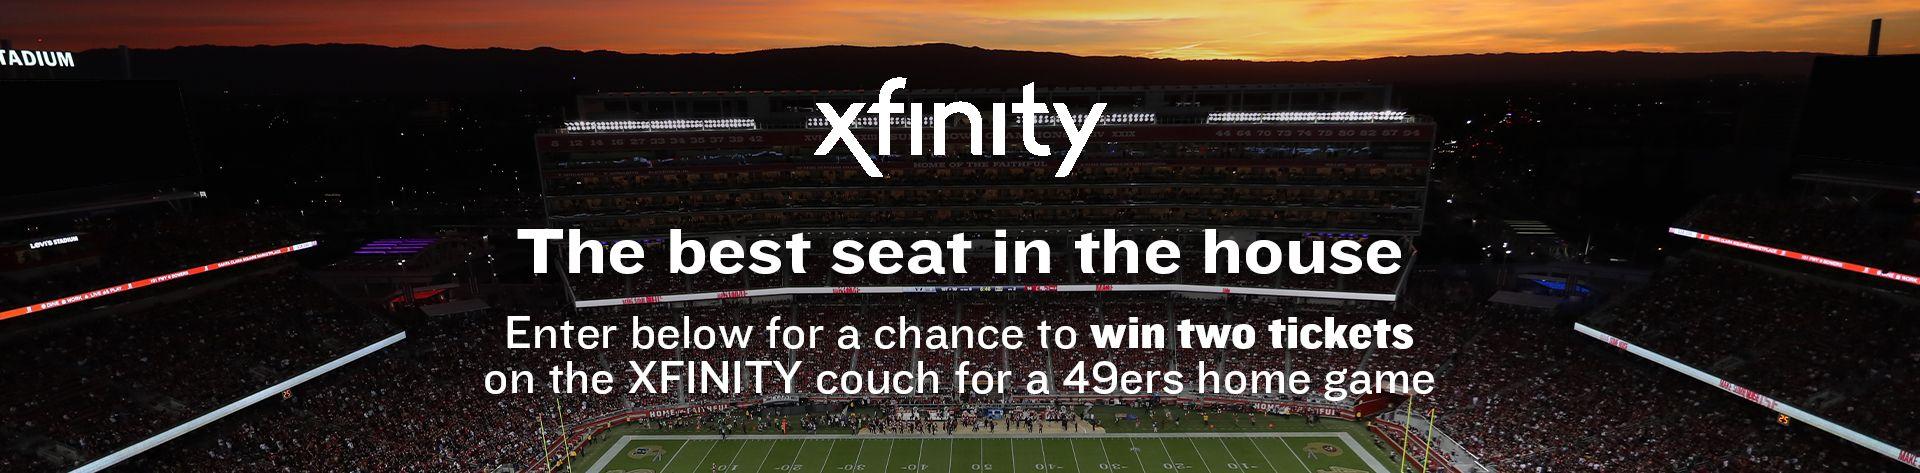 Xfinity-BestSeat